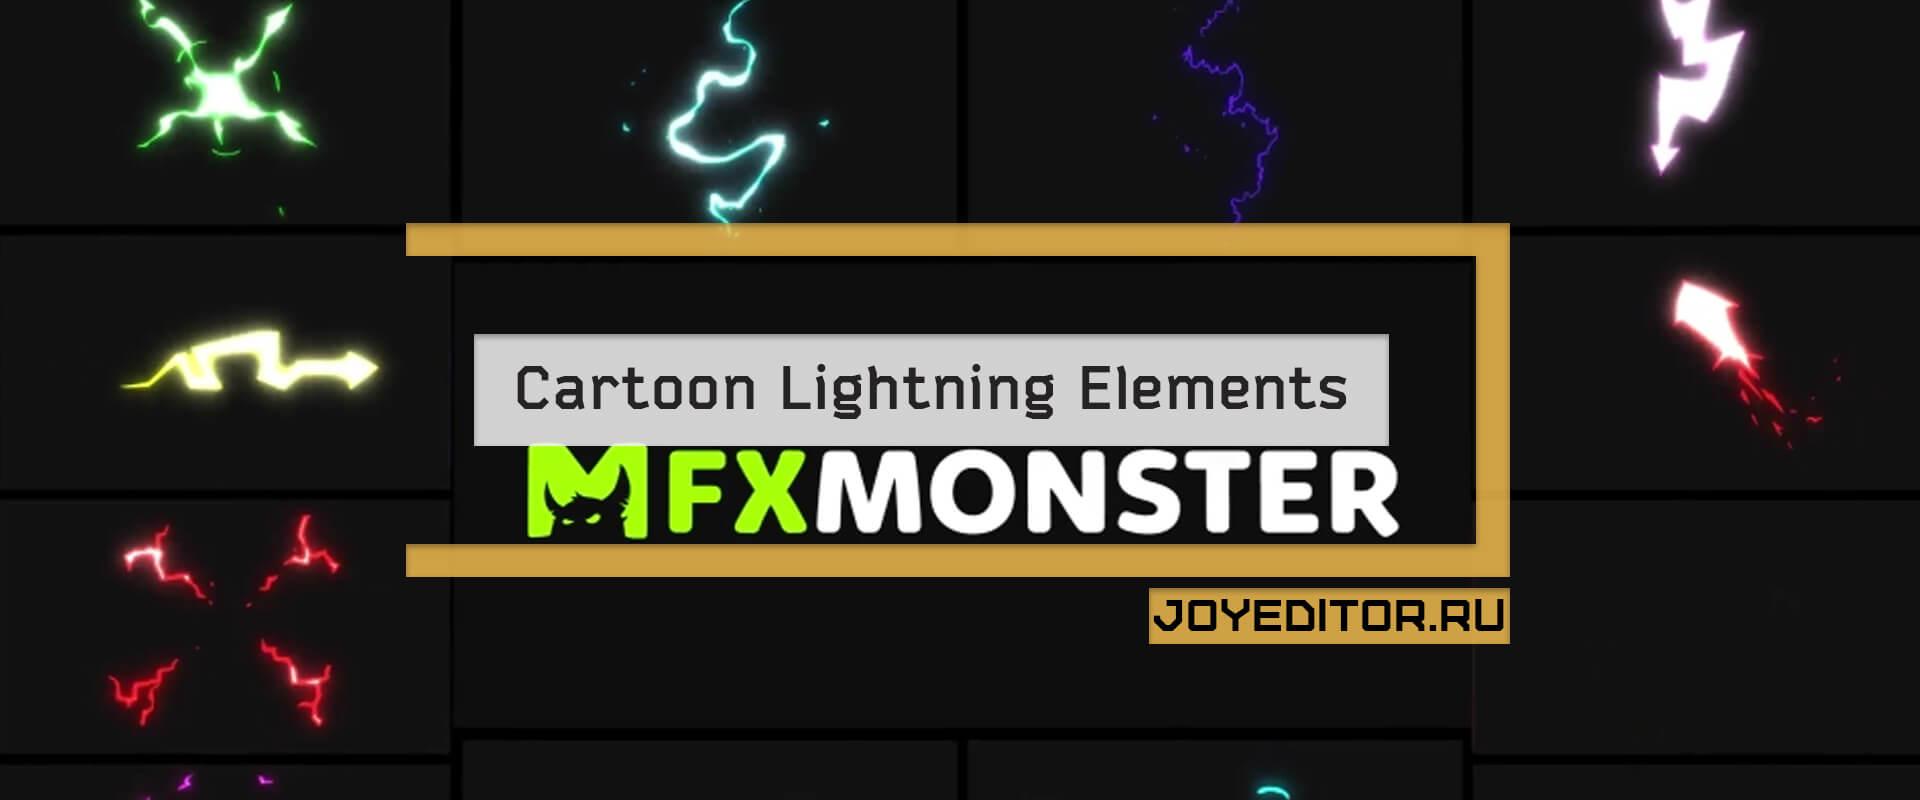 Cartoon Lightning Elements